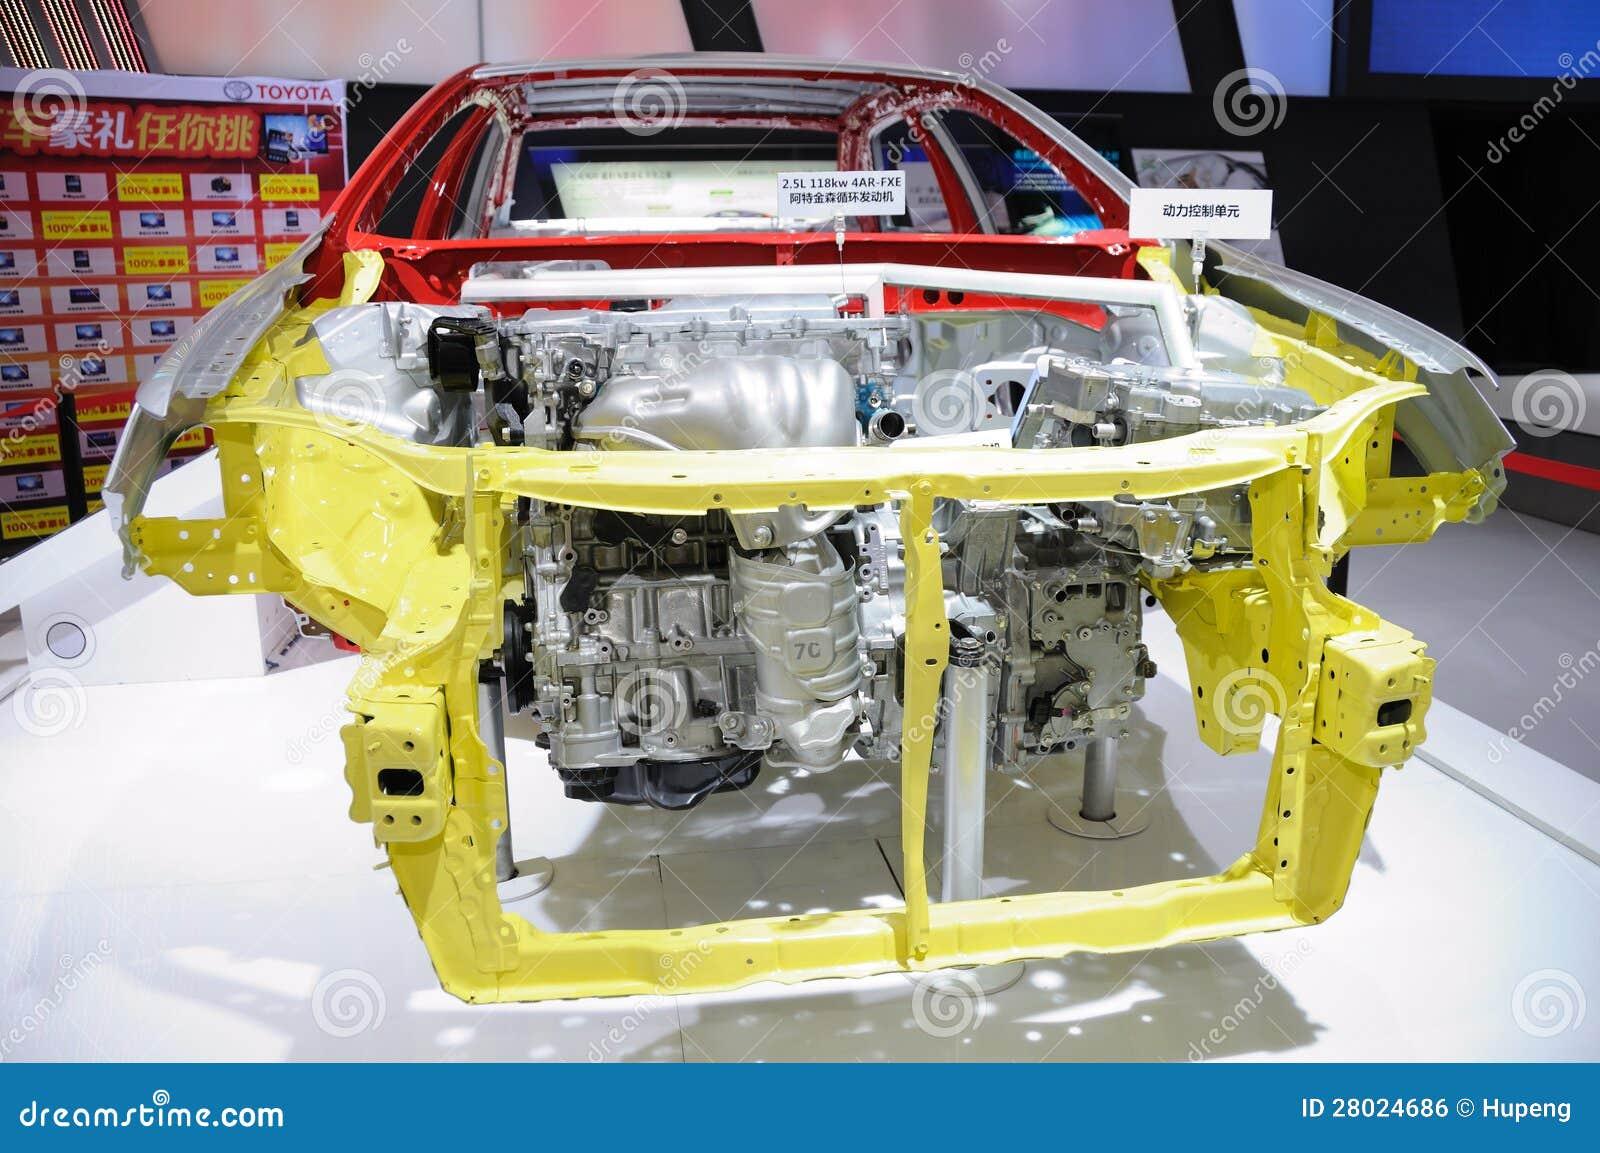 Toyota Camry car body